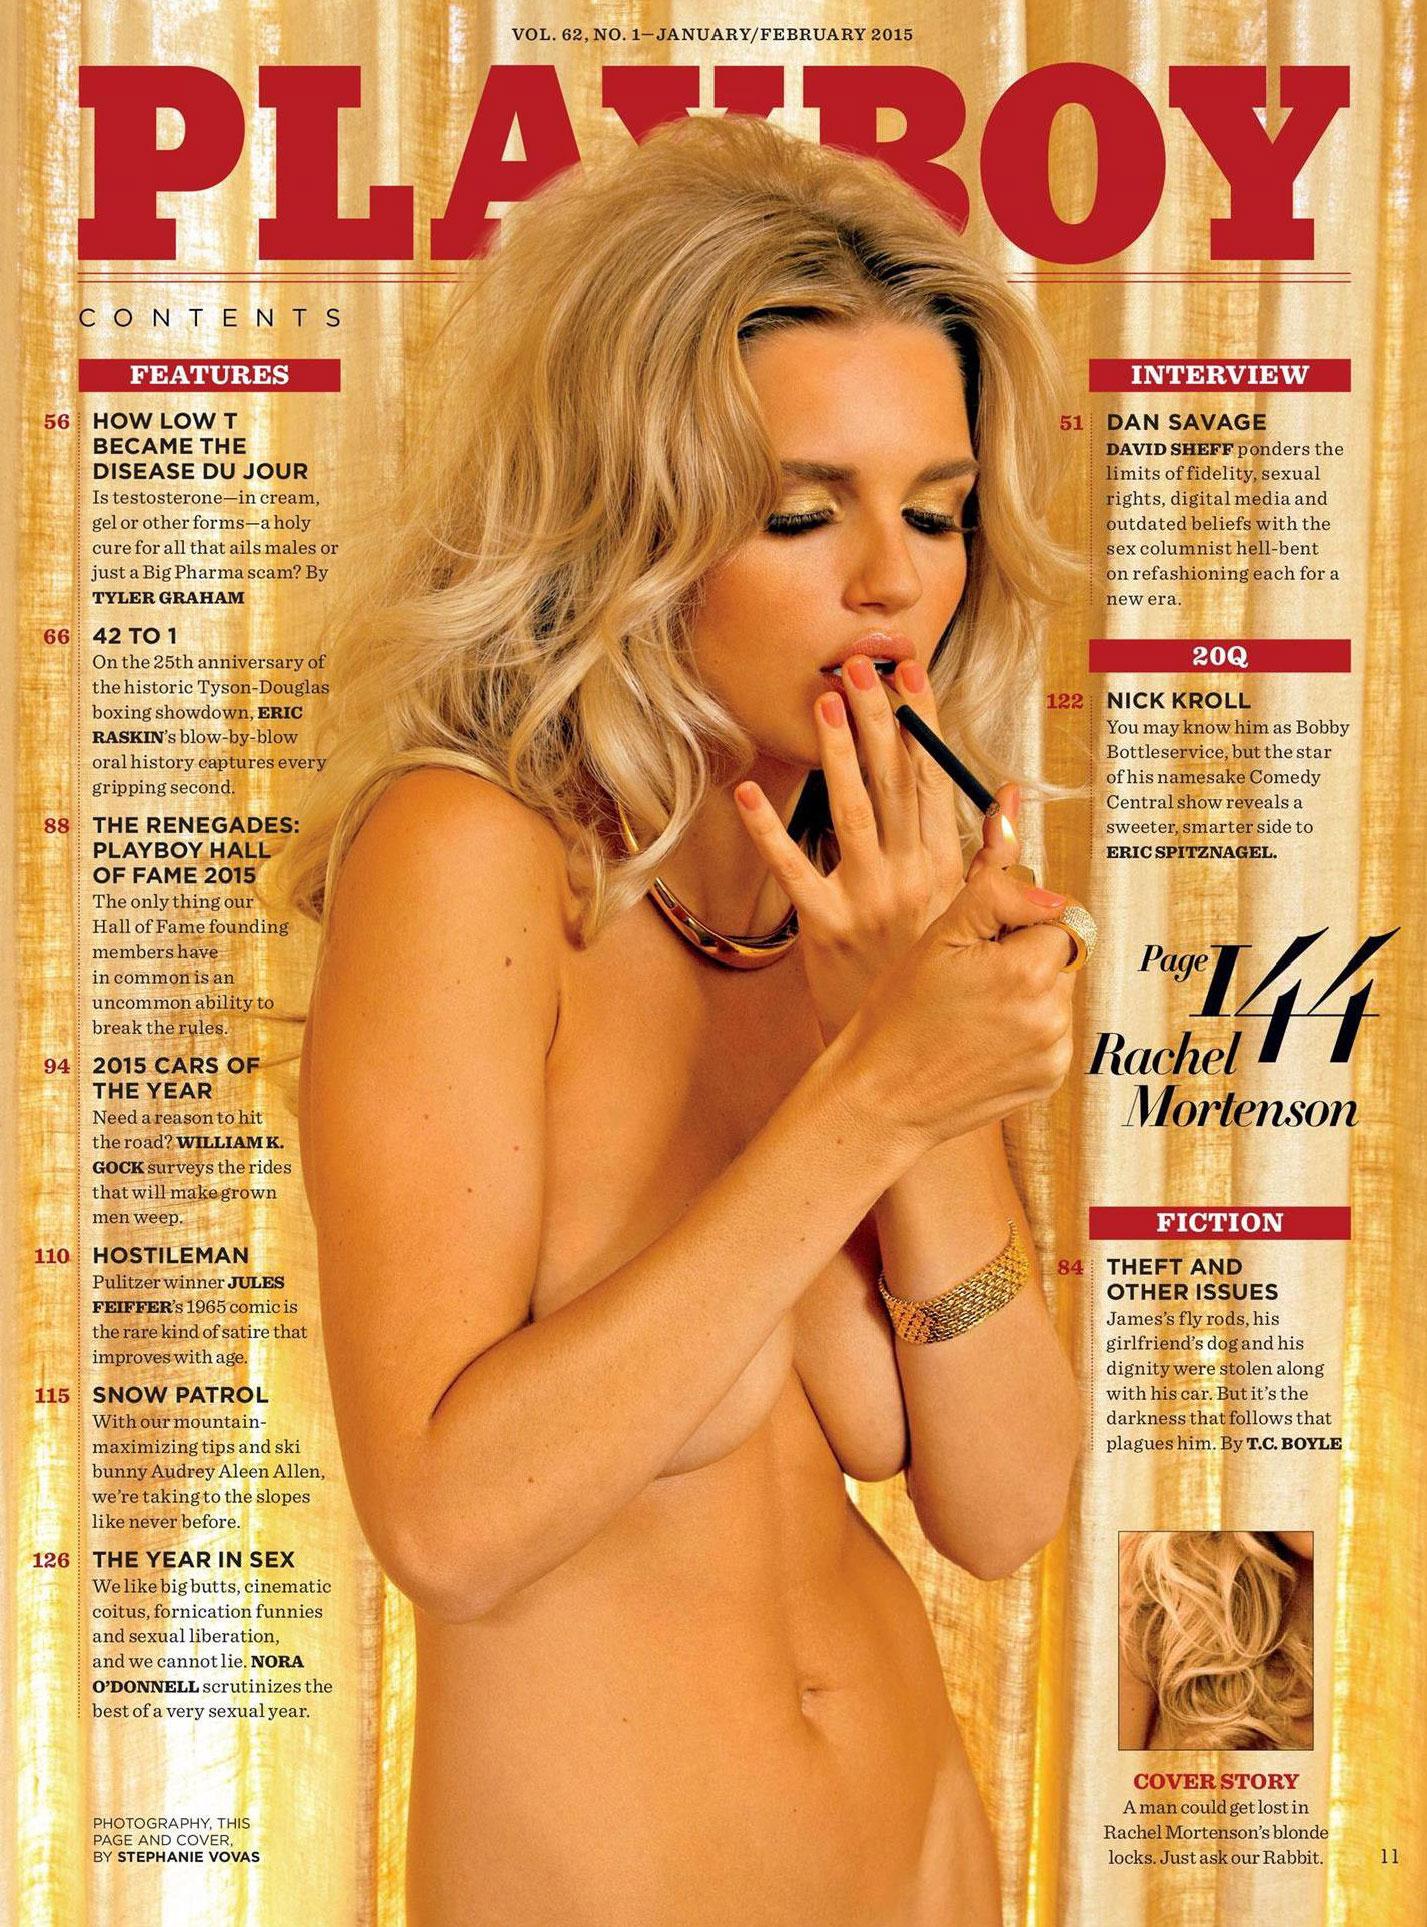 Alone Again / Rachel Mortenson в журнале Playboy US, январь-февраль 2019 / фотограф Stephanie Vovas